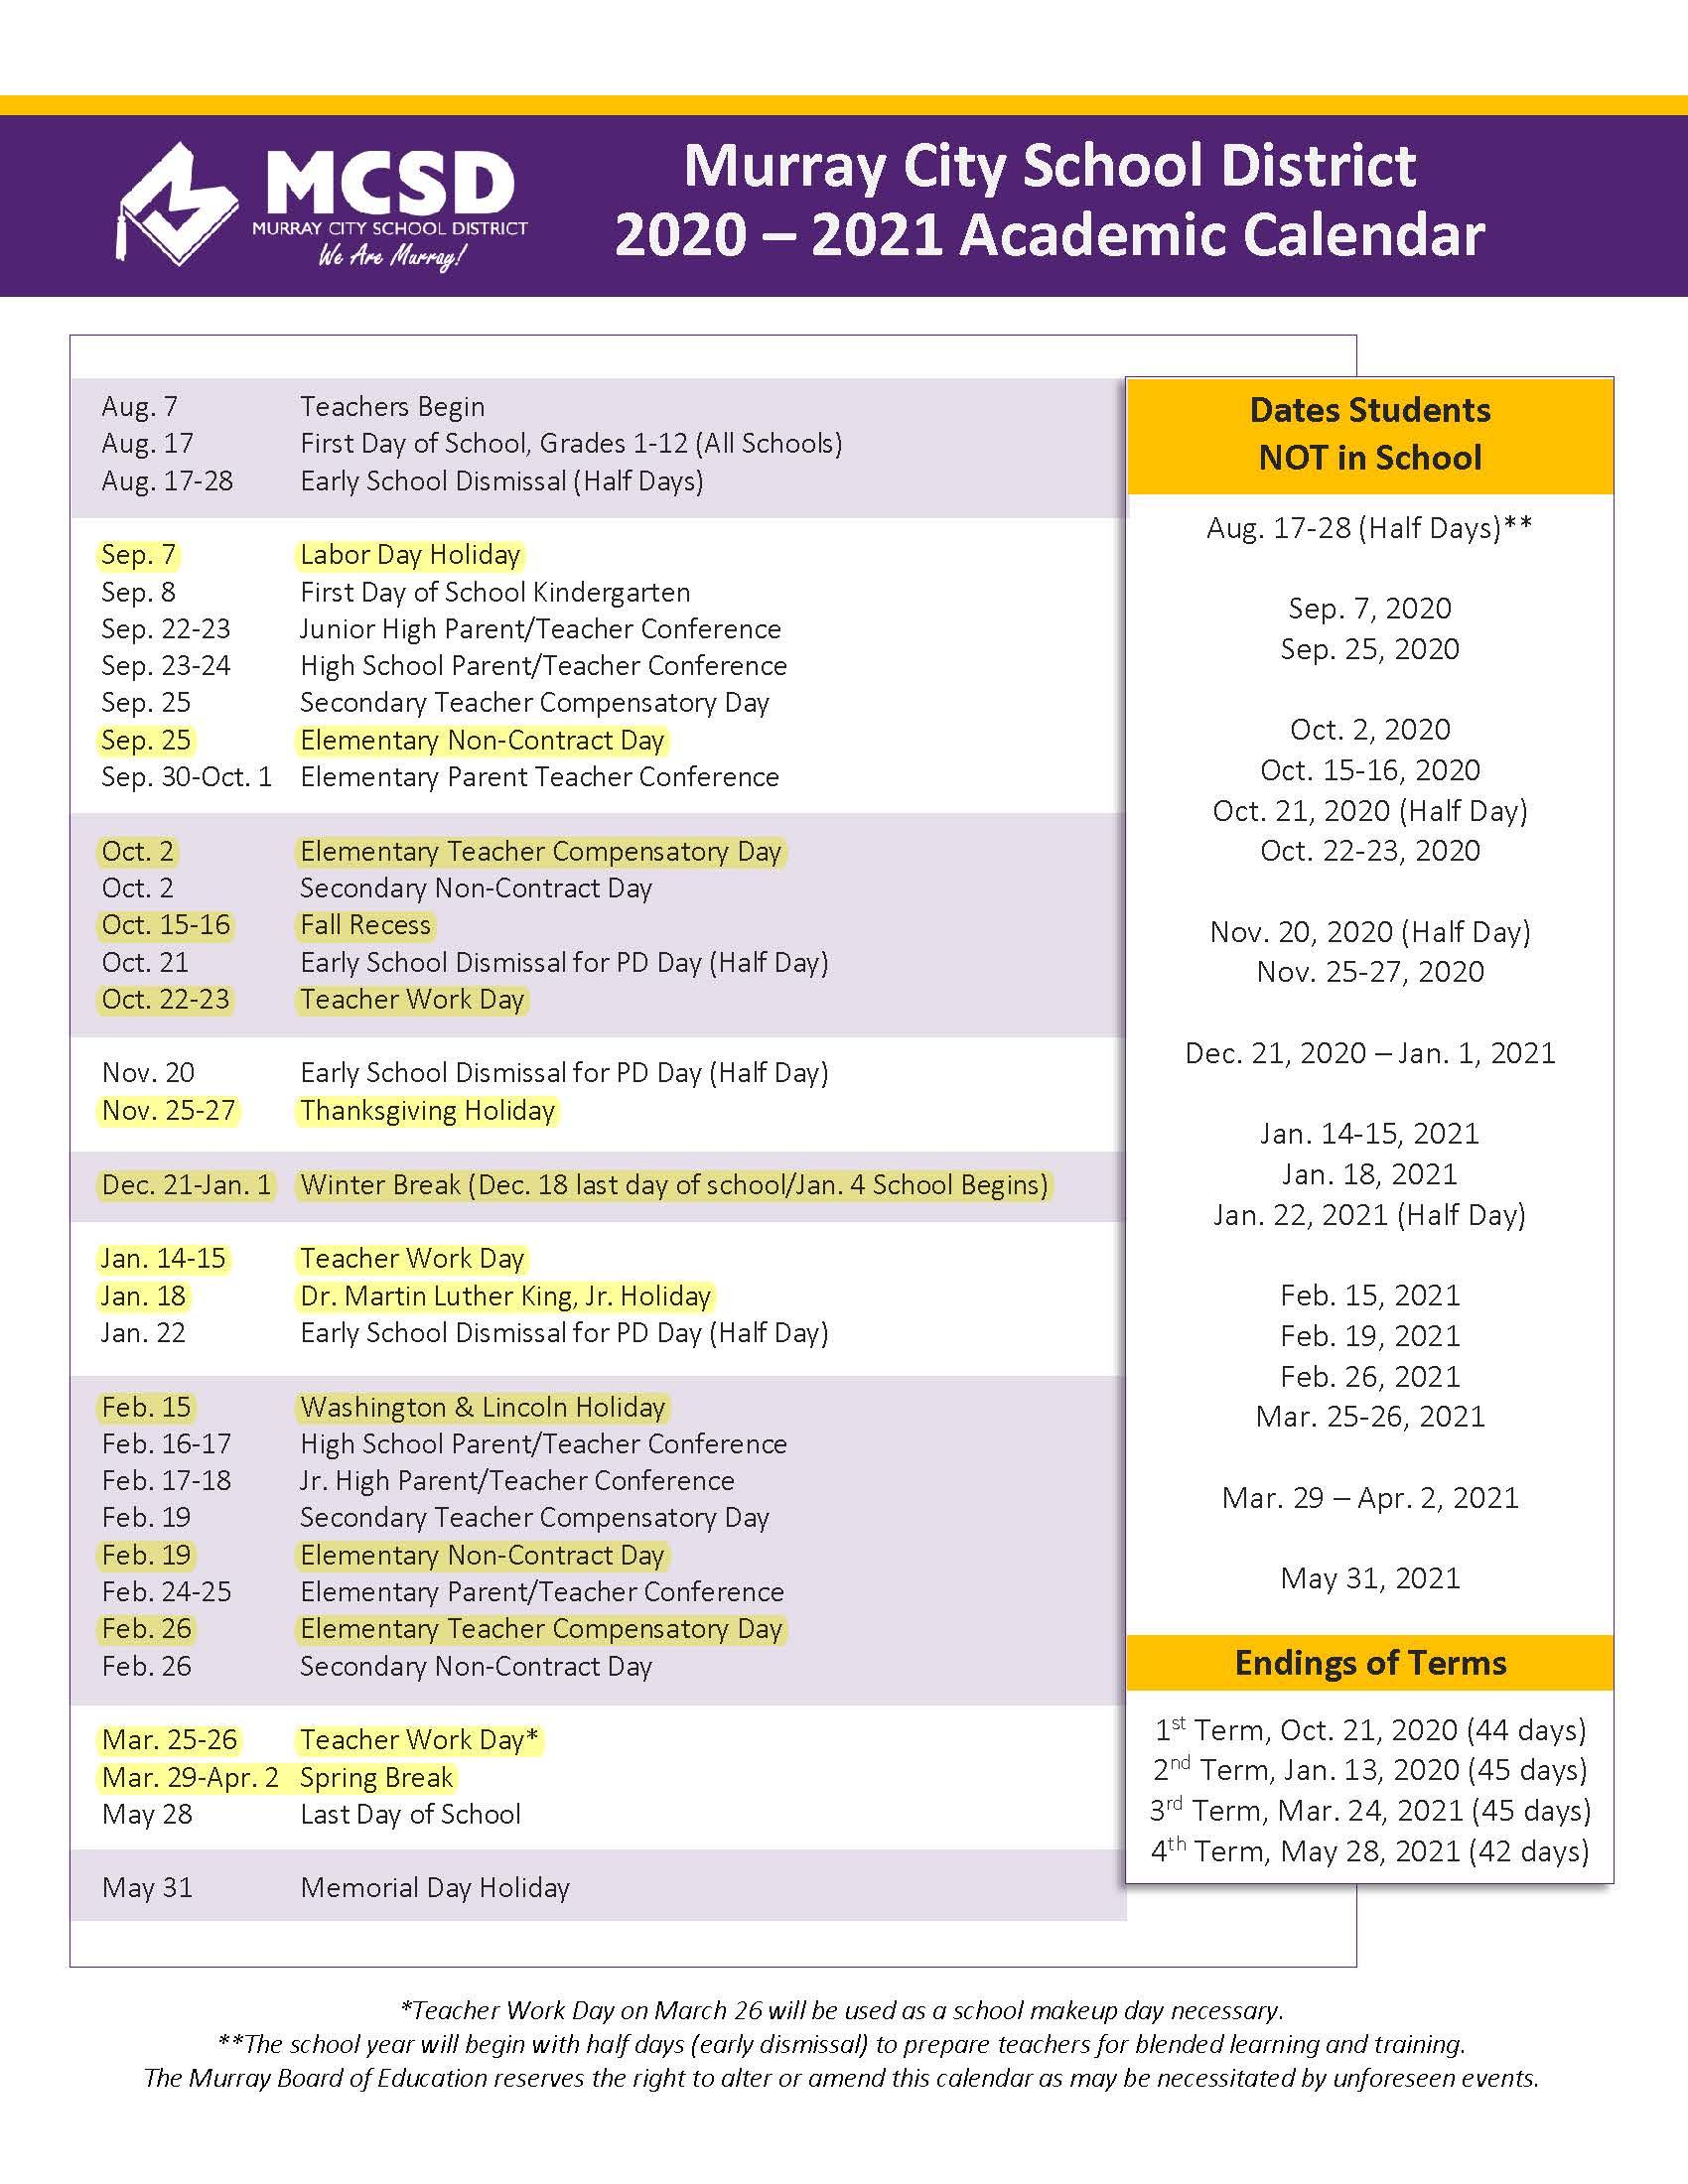 Updated school calendar 2020-2021